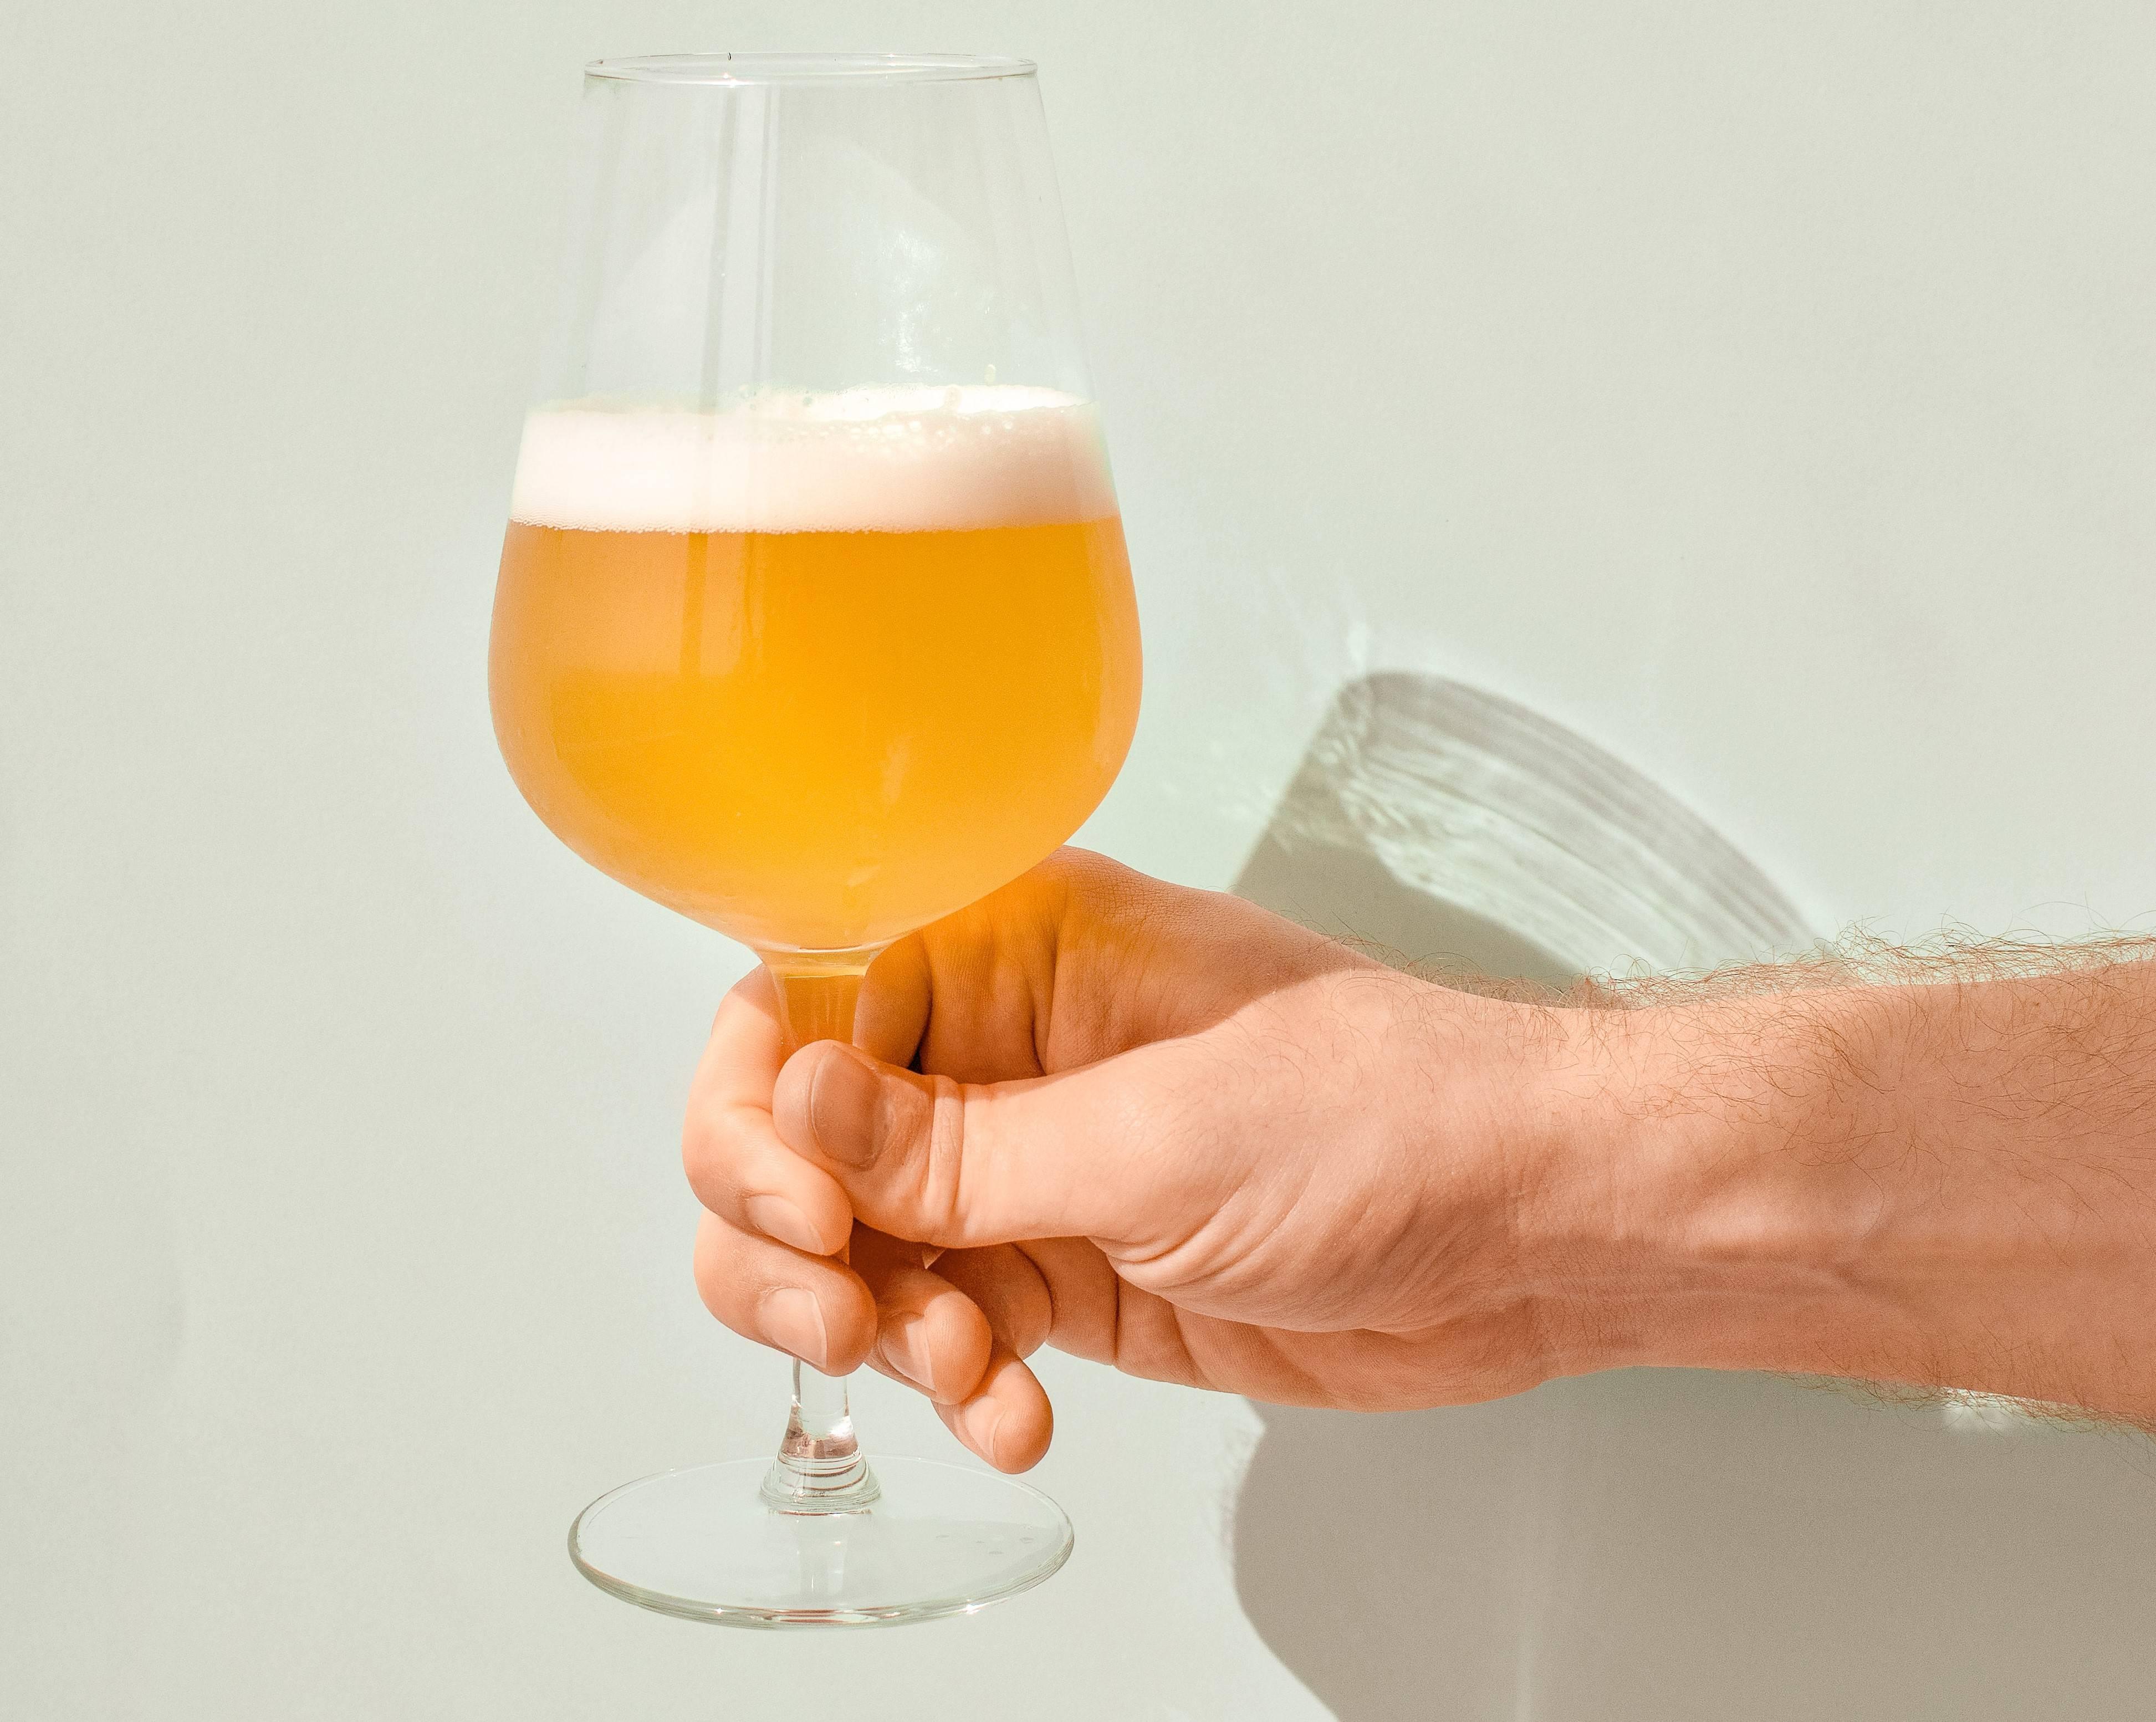 www.juicysantos.com.br - concurso cerveja artesanal santista